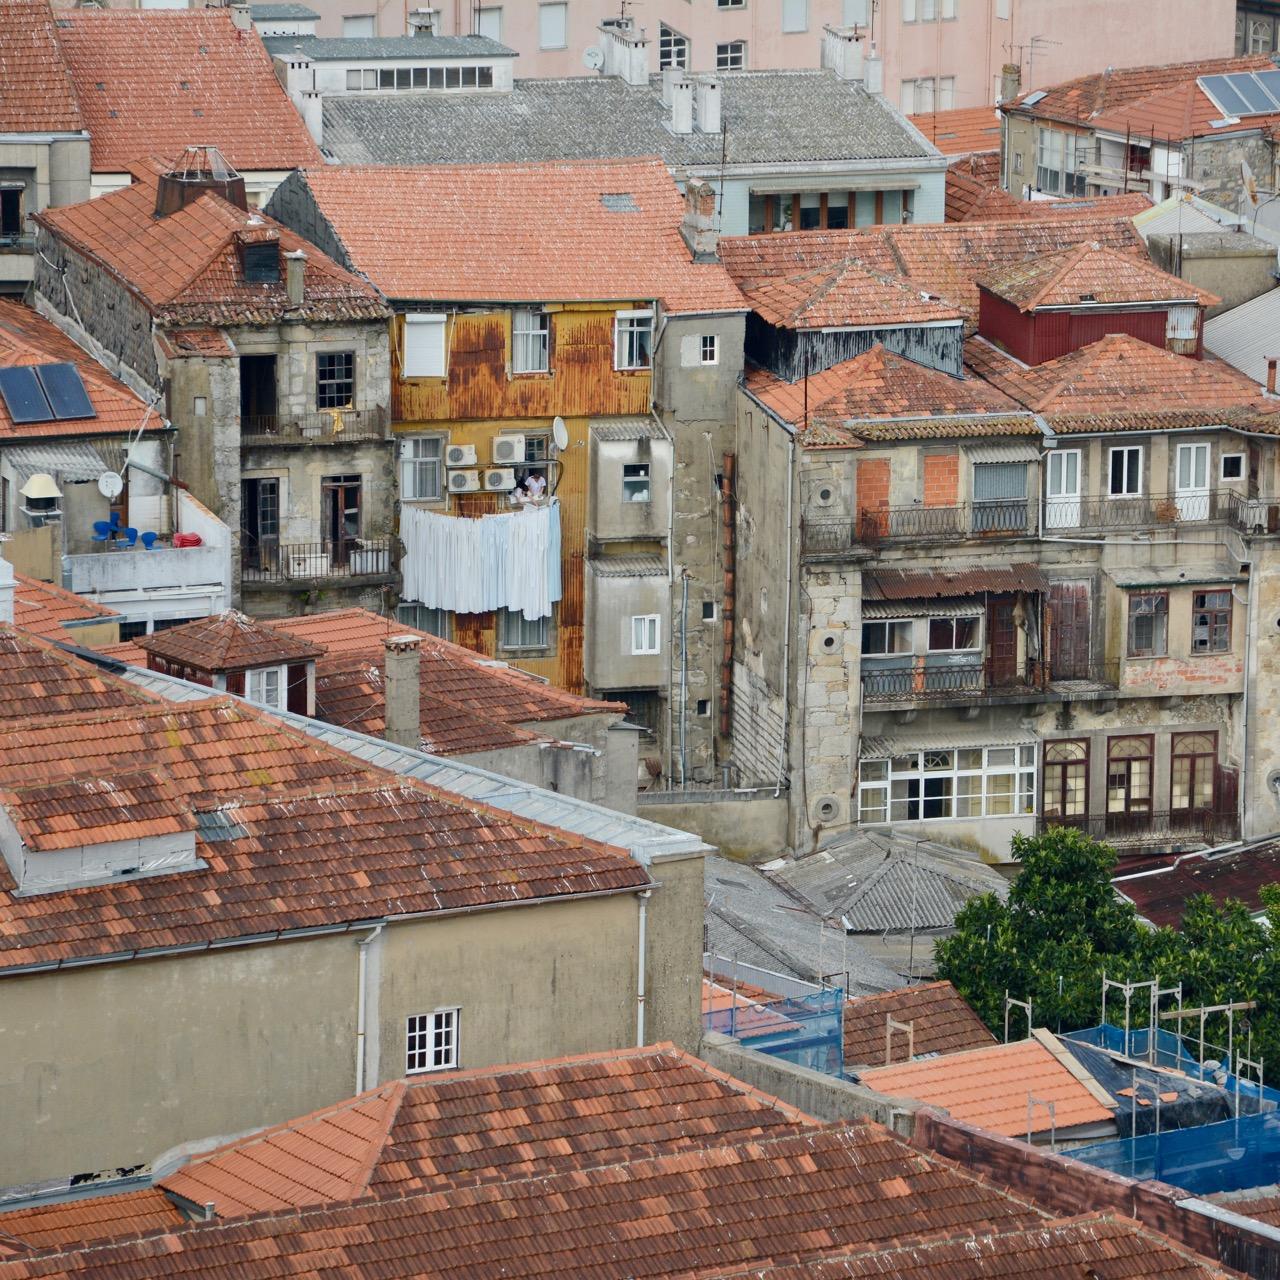 travel with kids children porto portugal view torre de clerigos